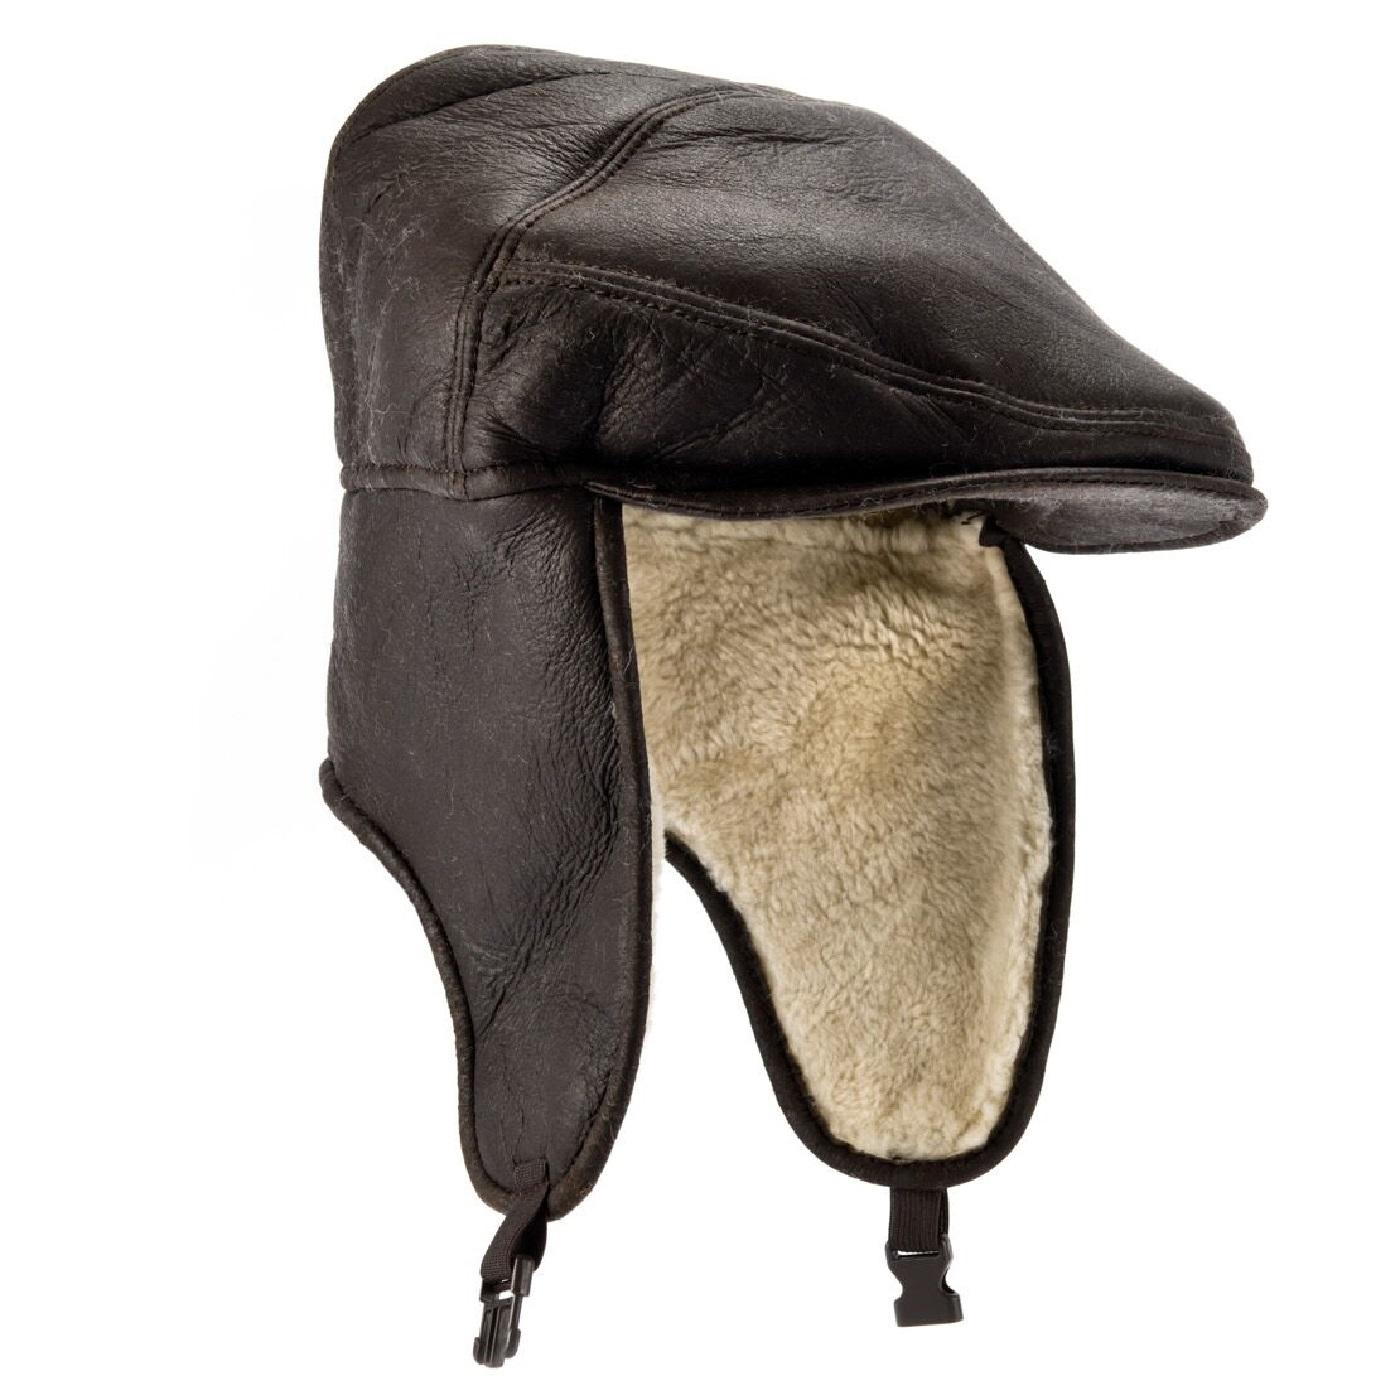 Eastern Counties Leather Herren Newton Schaffell Nappa Nappa Nappa Finish Kappe (EL242)  | Stil  b464f1